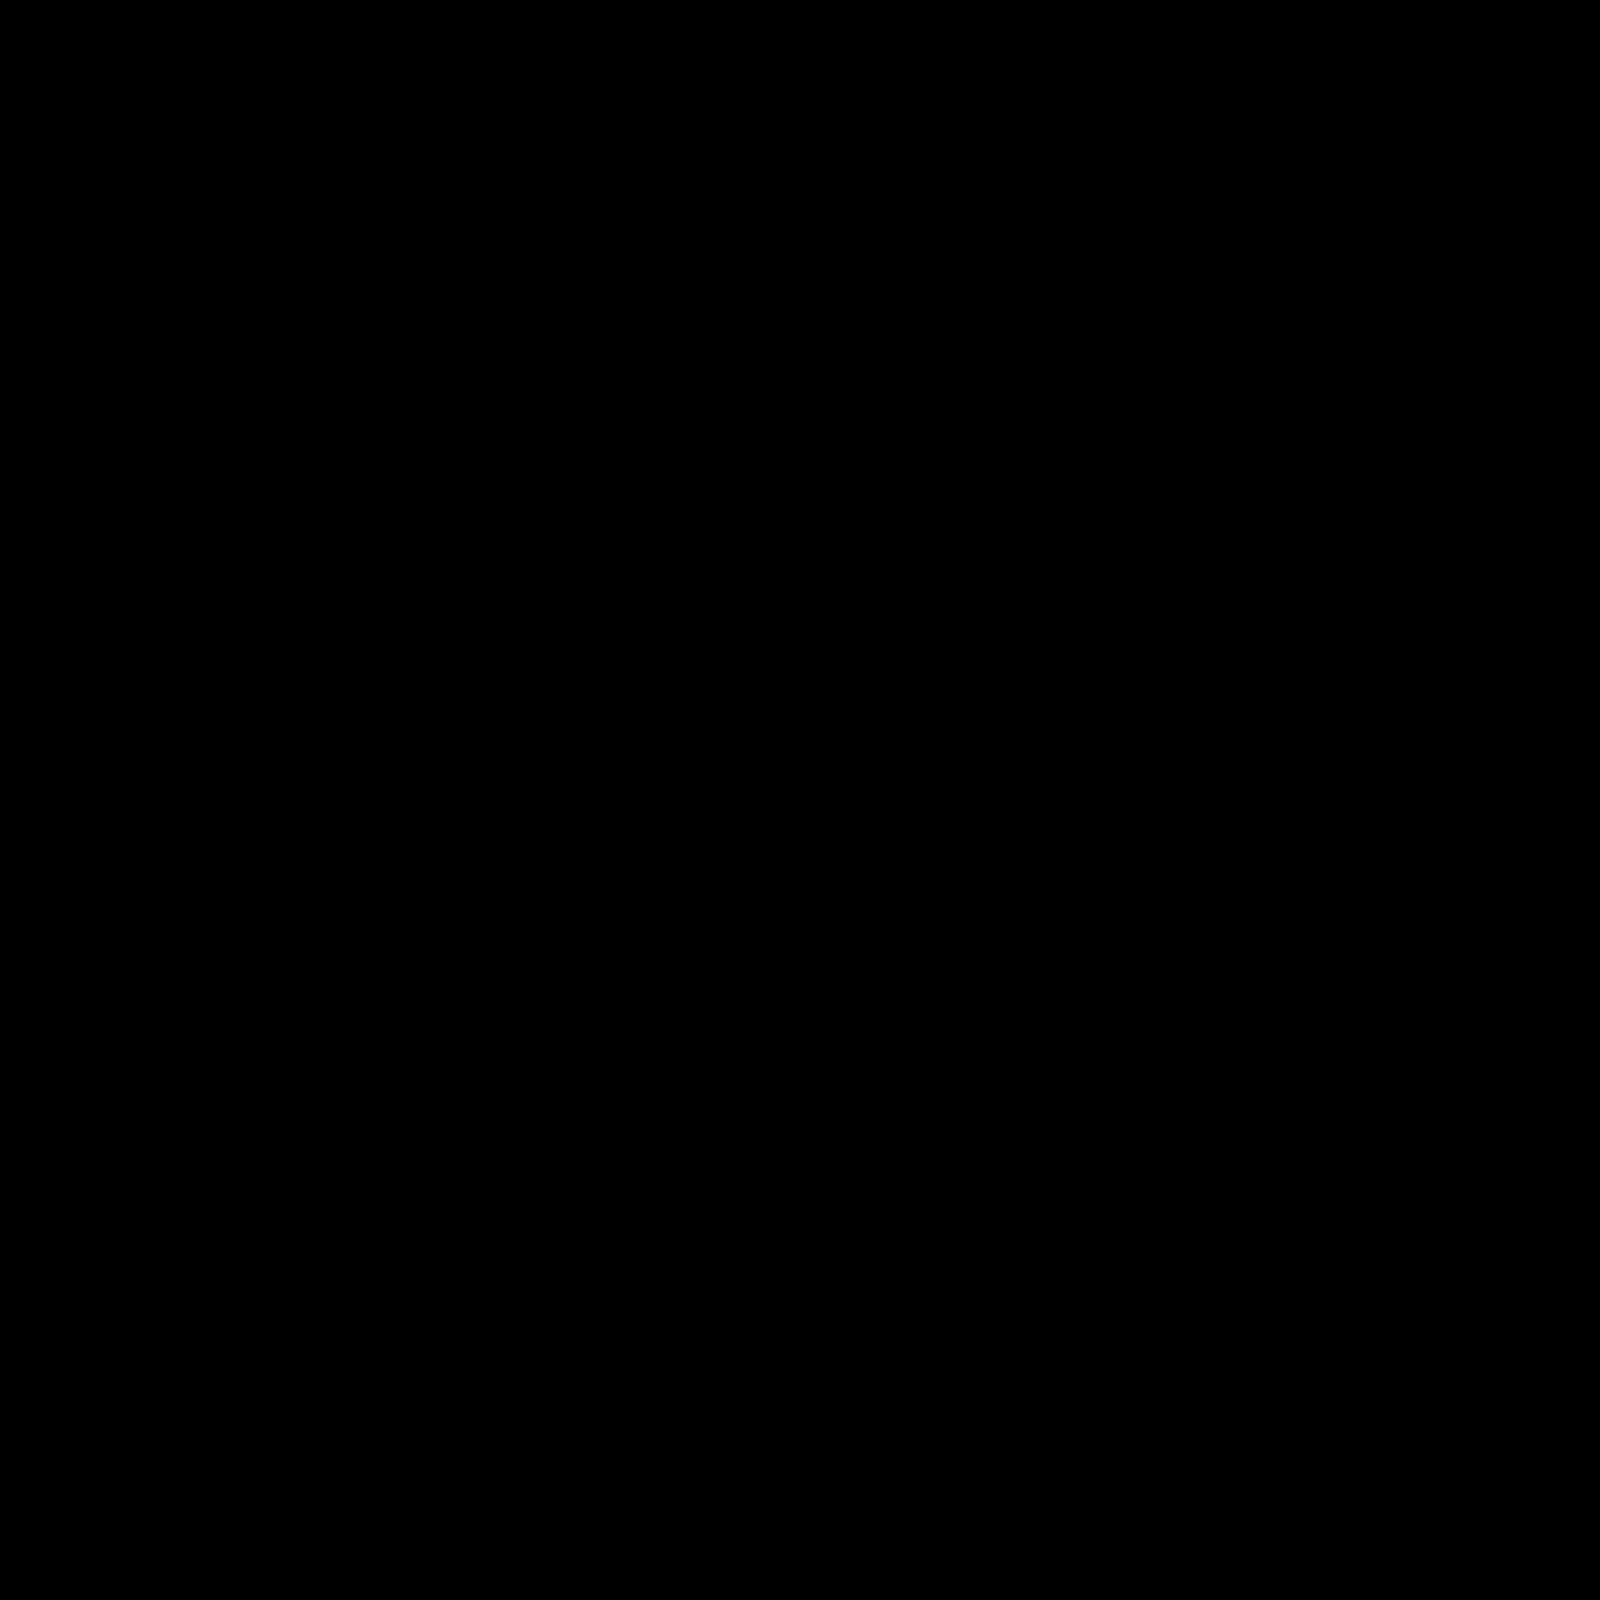 Japan Map icon